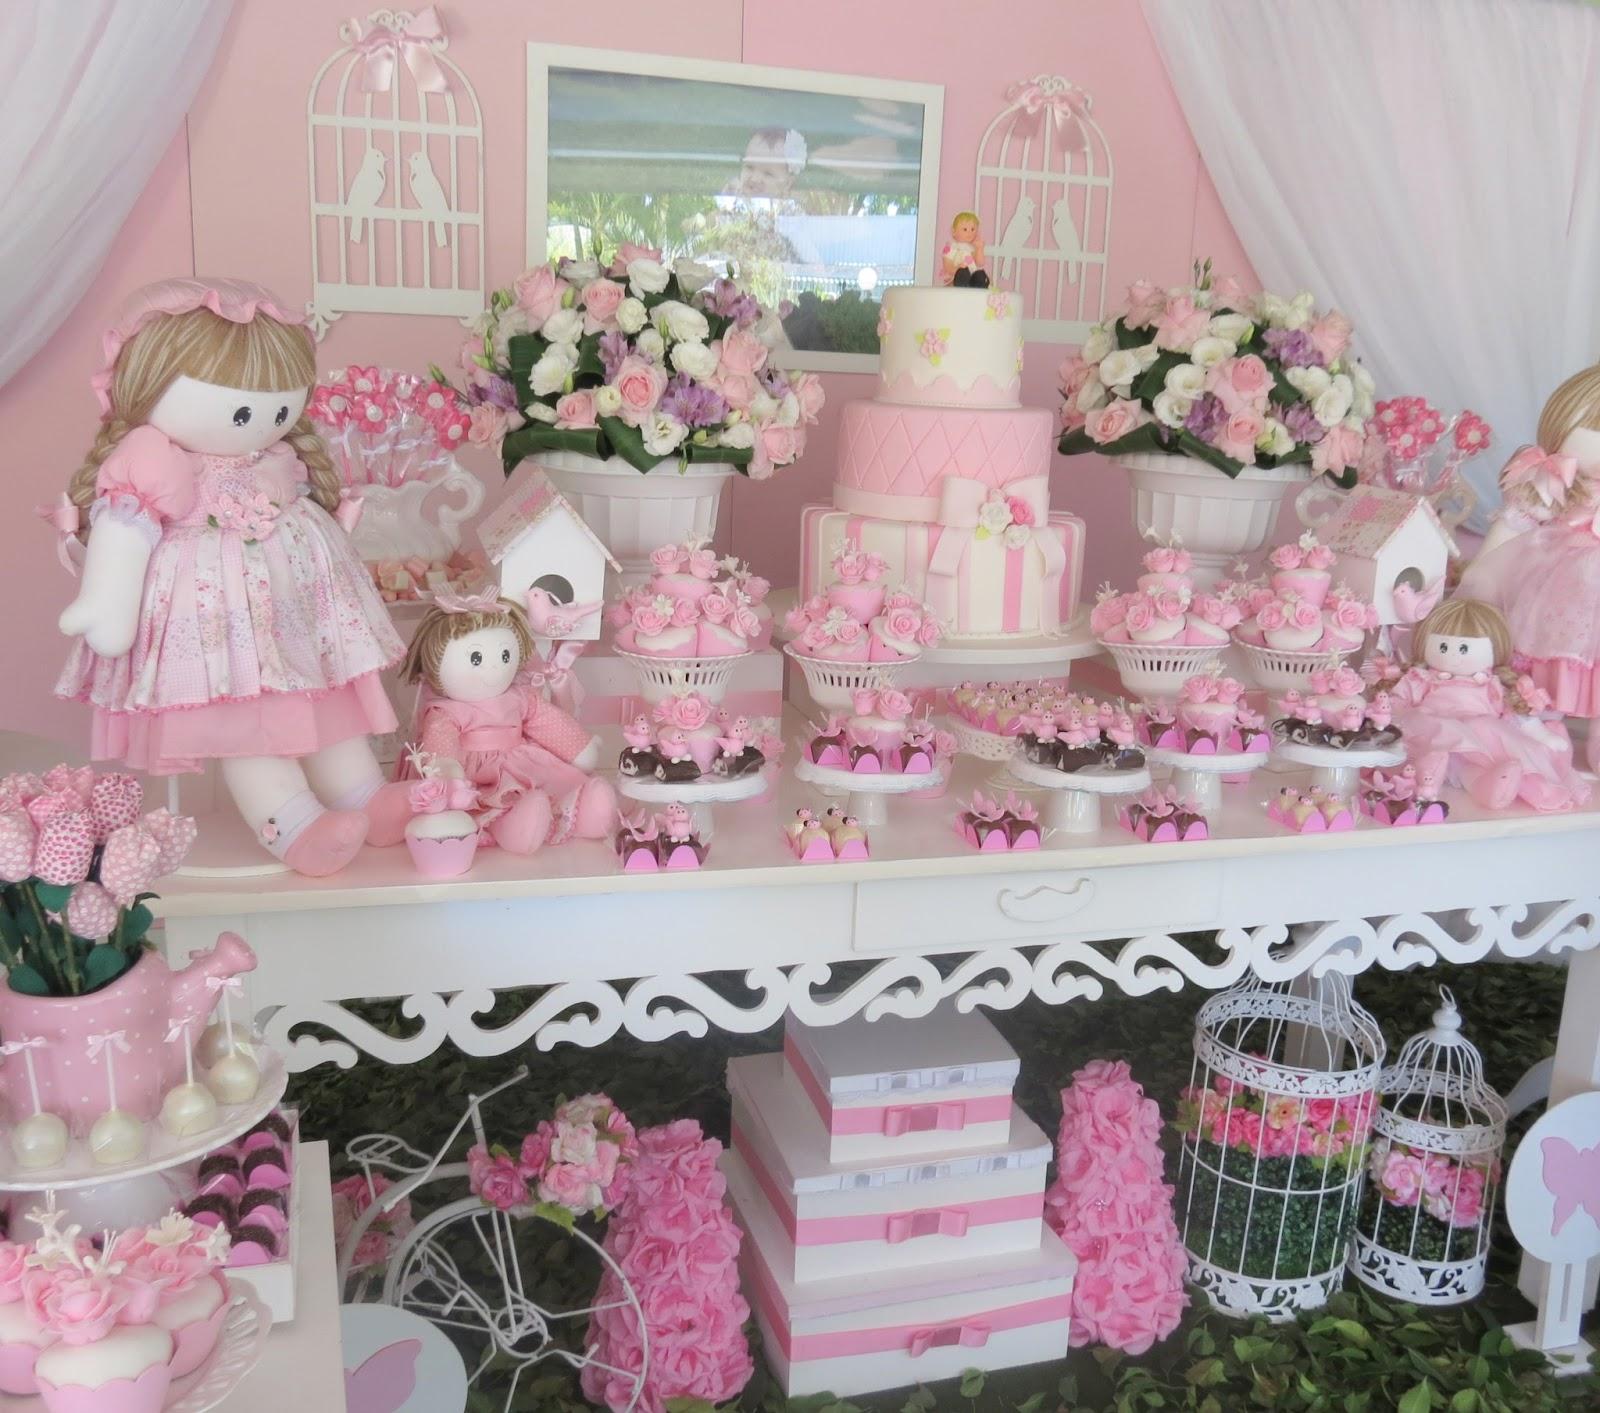 festa jardim da princesa : festa jardim da princesa:Festa Provençal – Site Oficial: Bonecas no Jardim da Carolina!